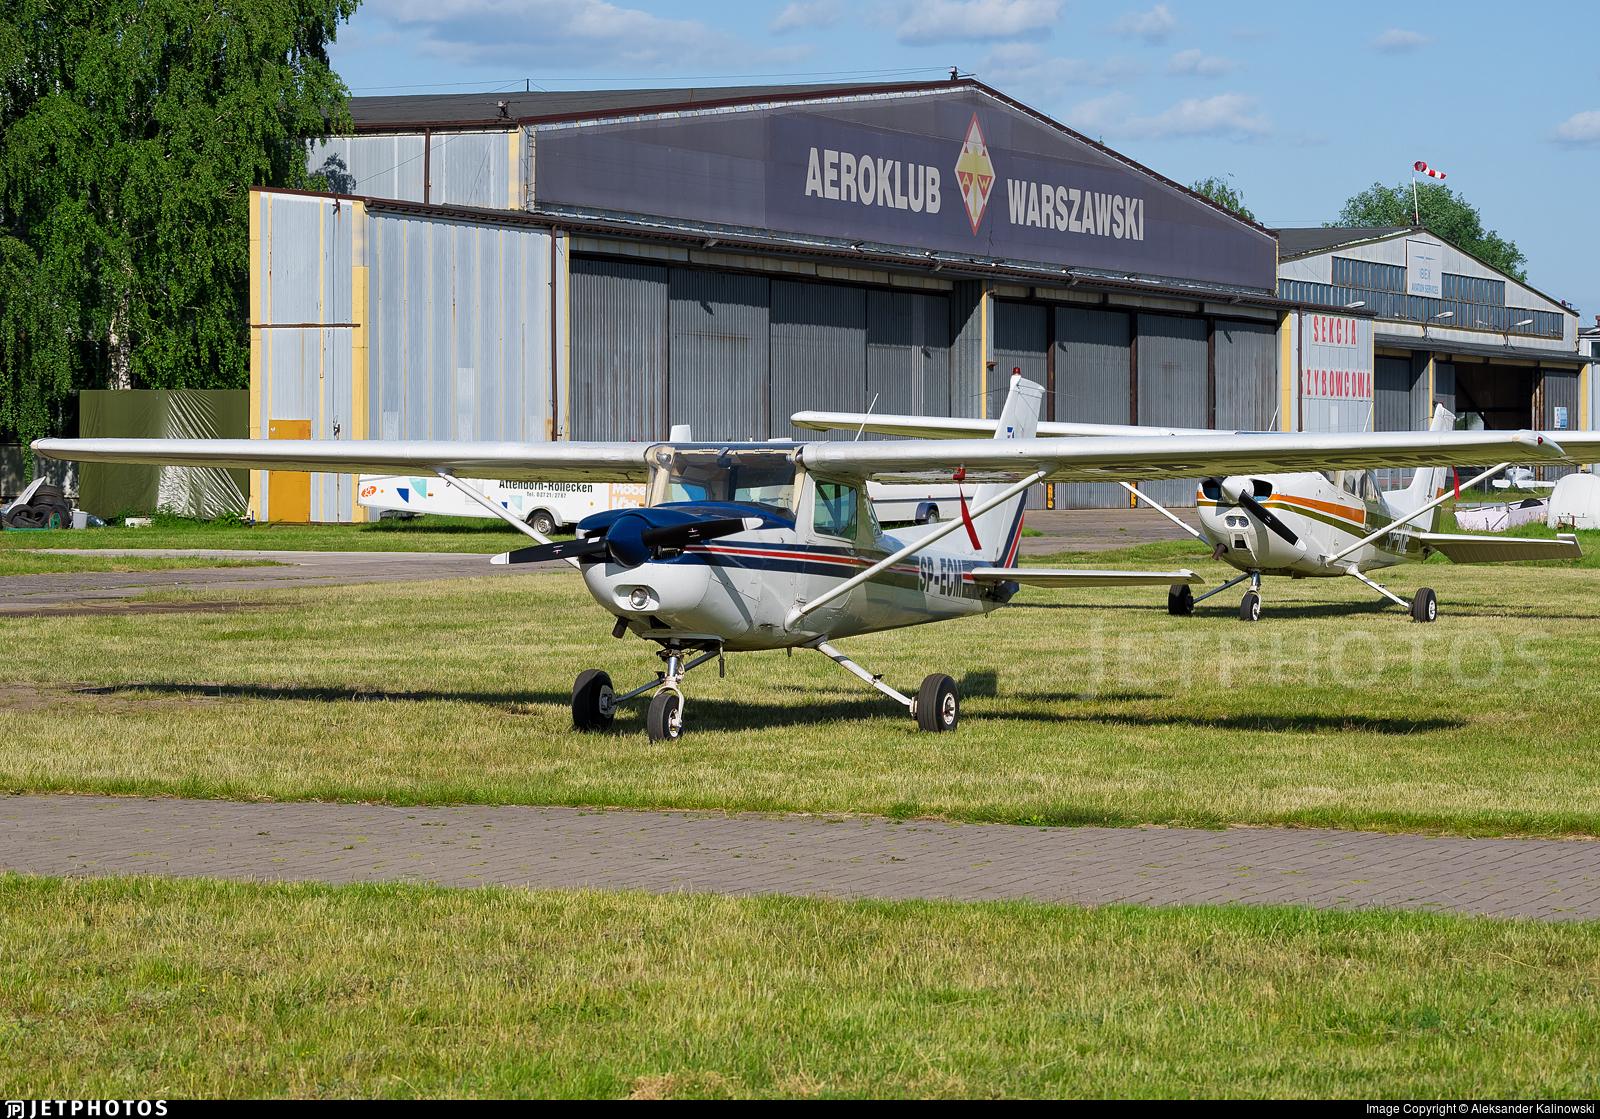 SP-ECM - Cessna 152 - Private